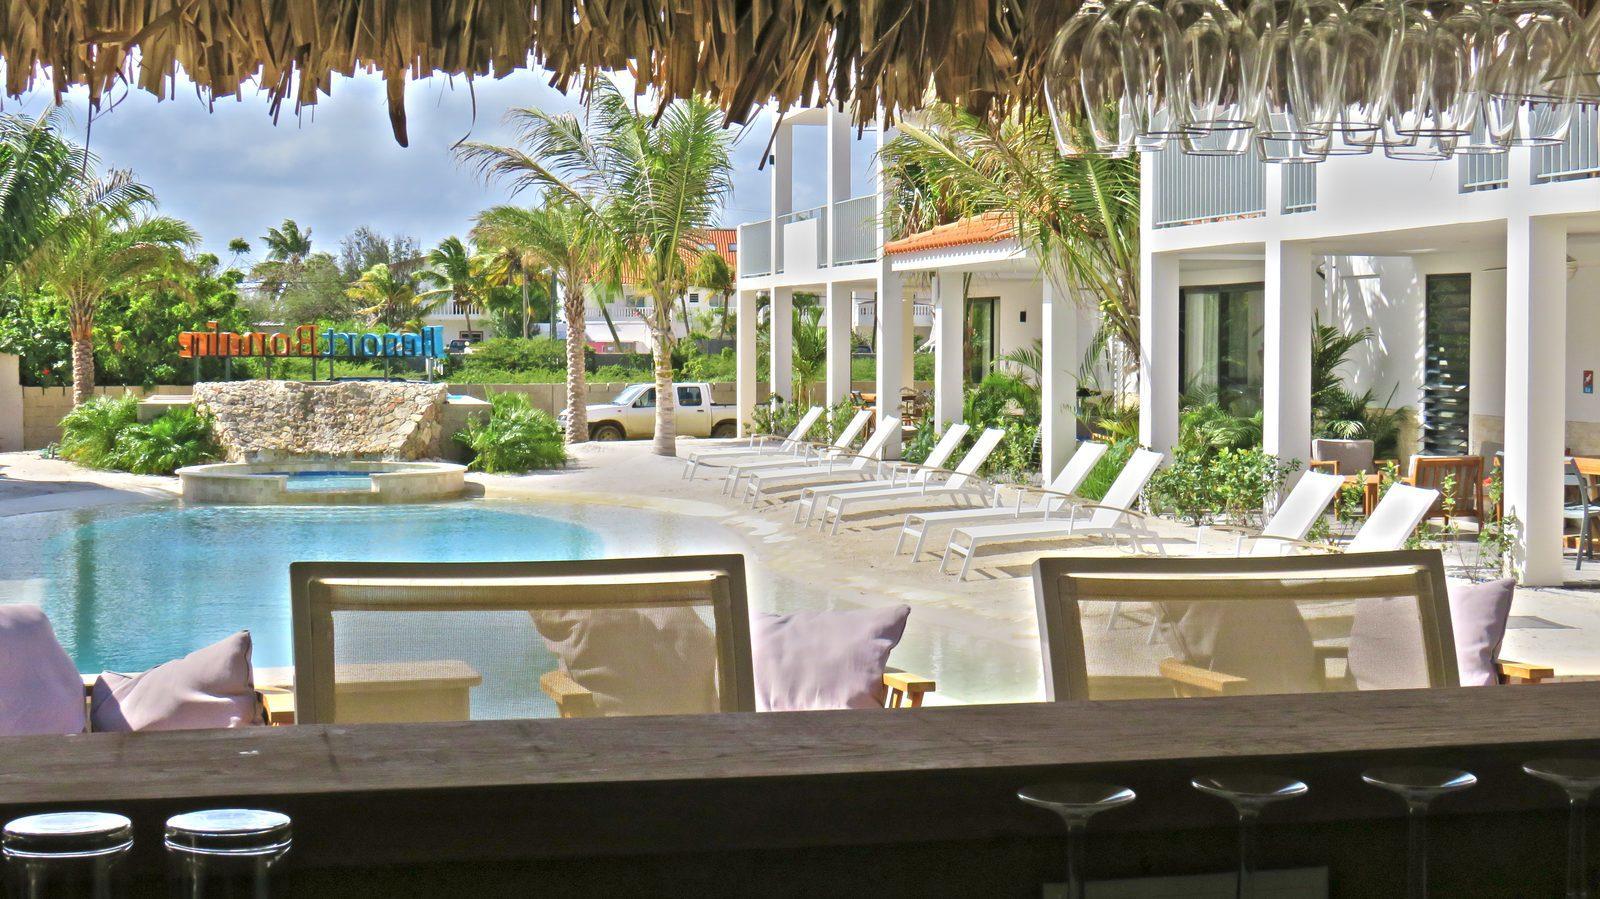 House for rent Bonaire